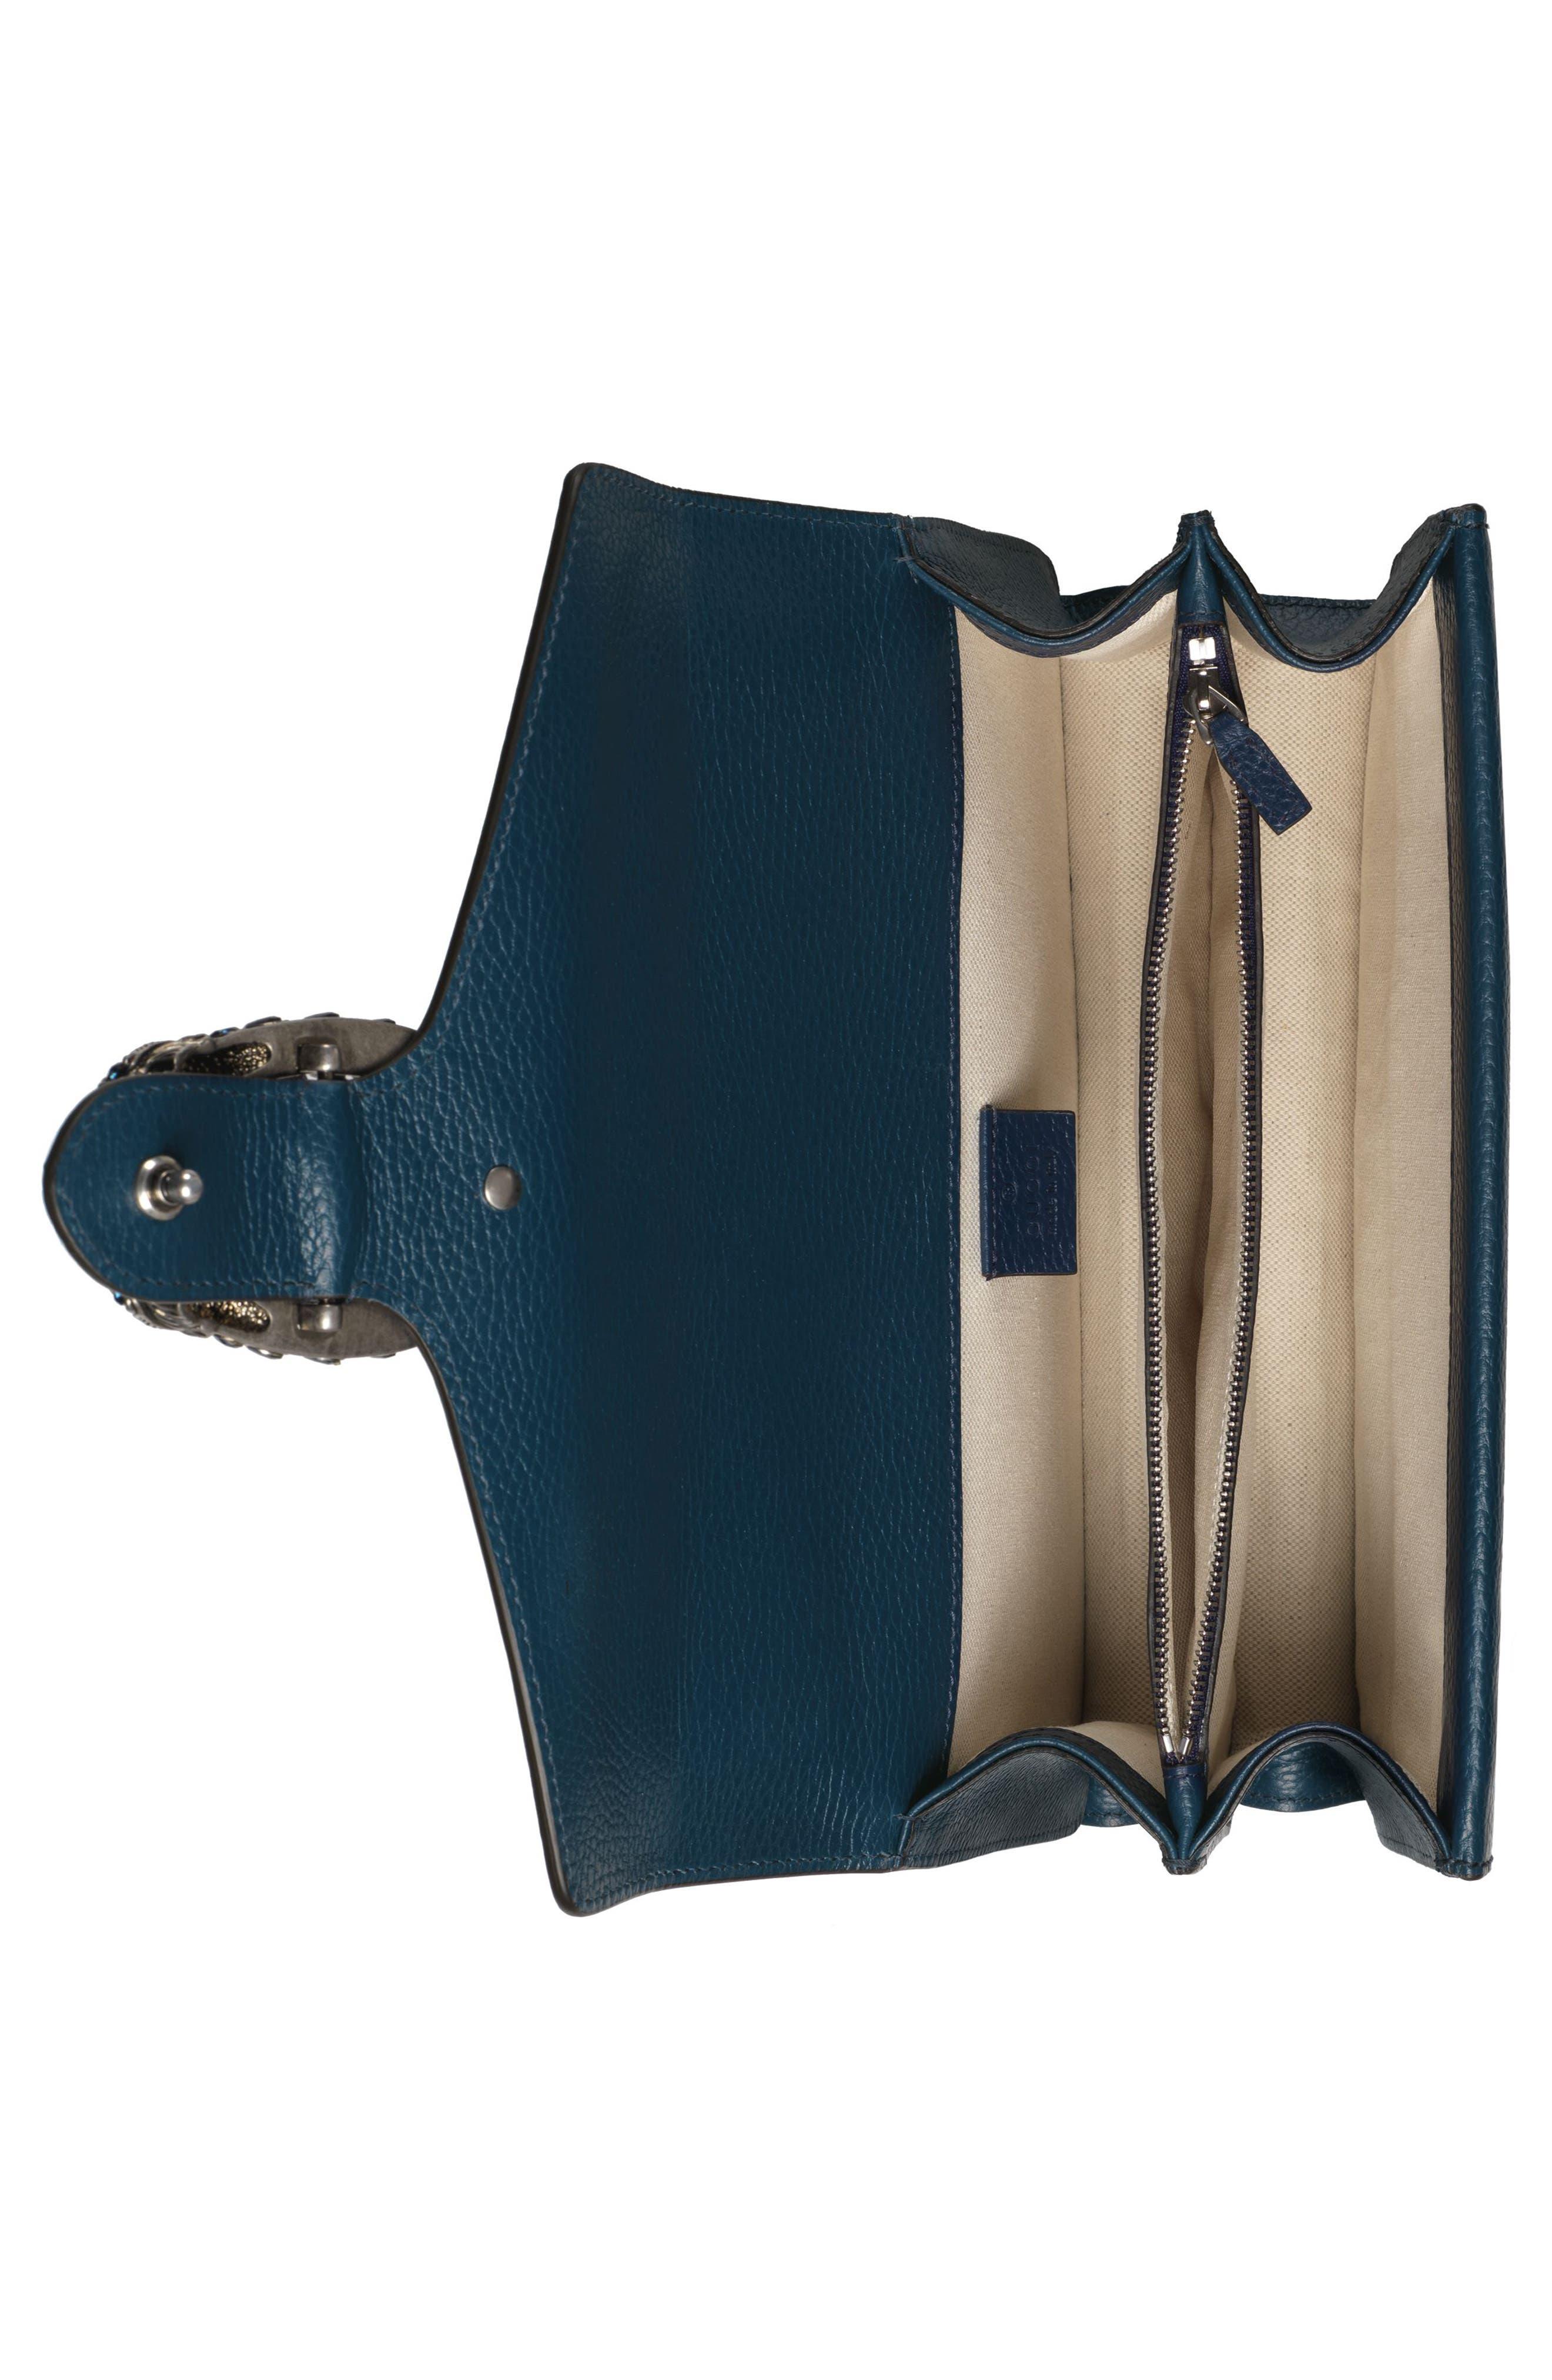 GUCCI, Small Dionysus Leather Shoulder Bag, Alternate thumbnail 3, color, BLU AGATA/ MONTANA